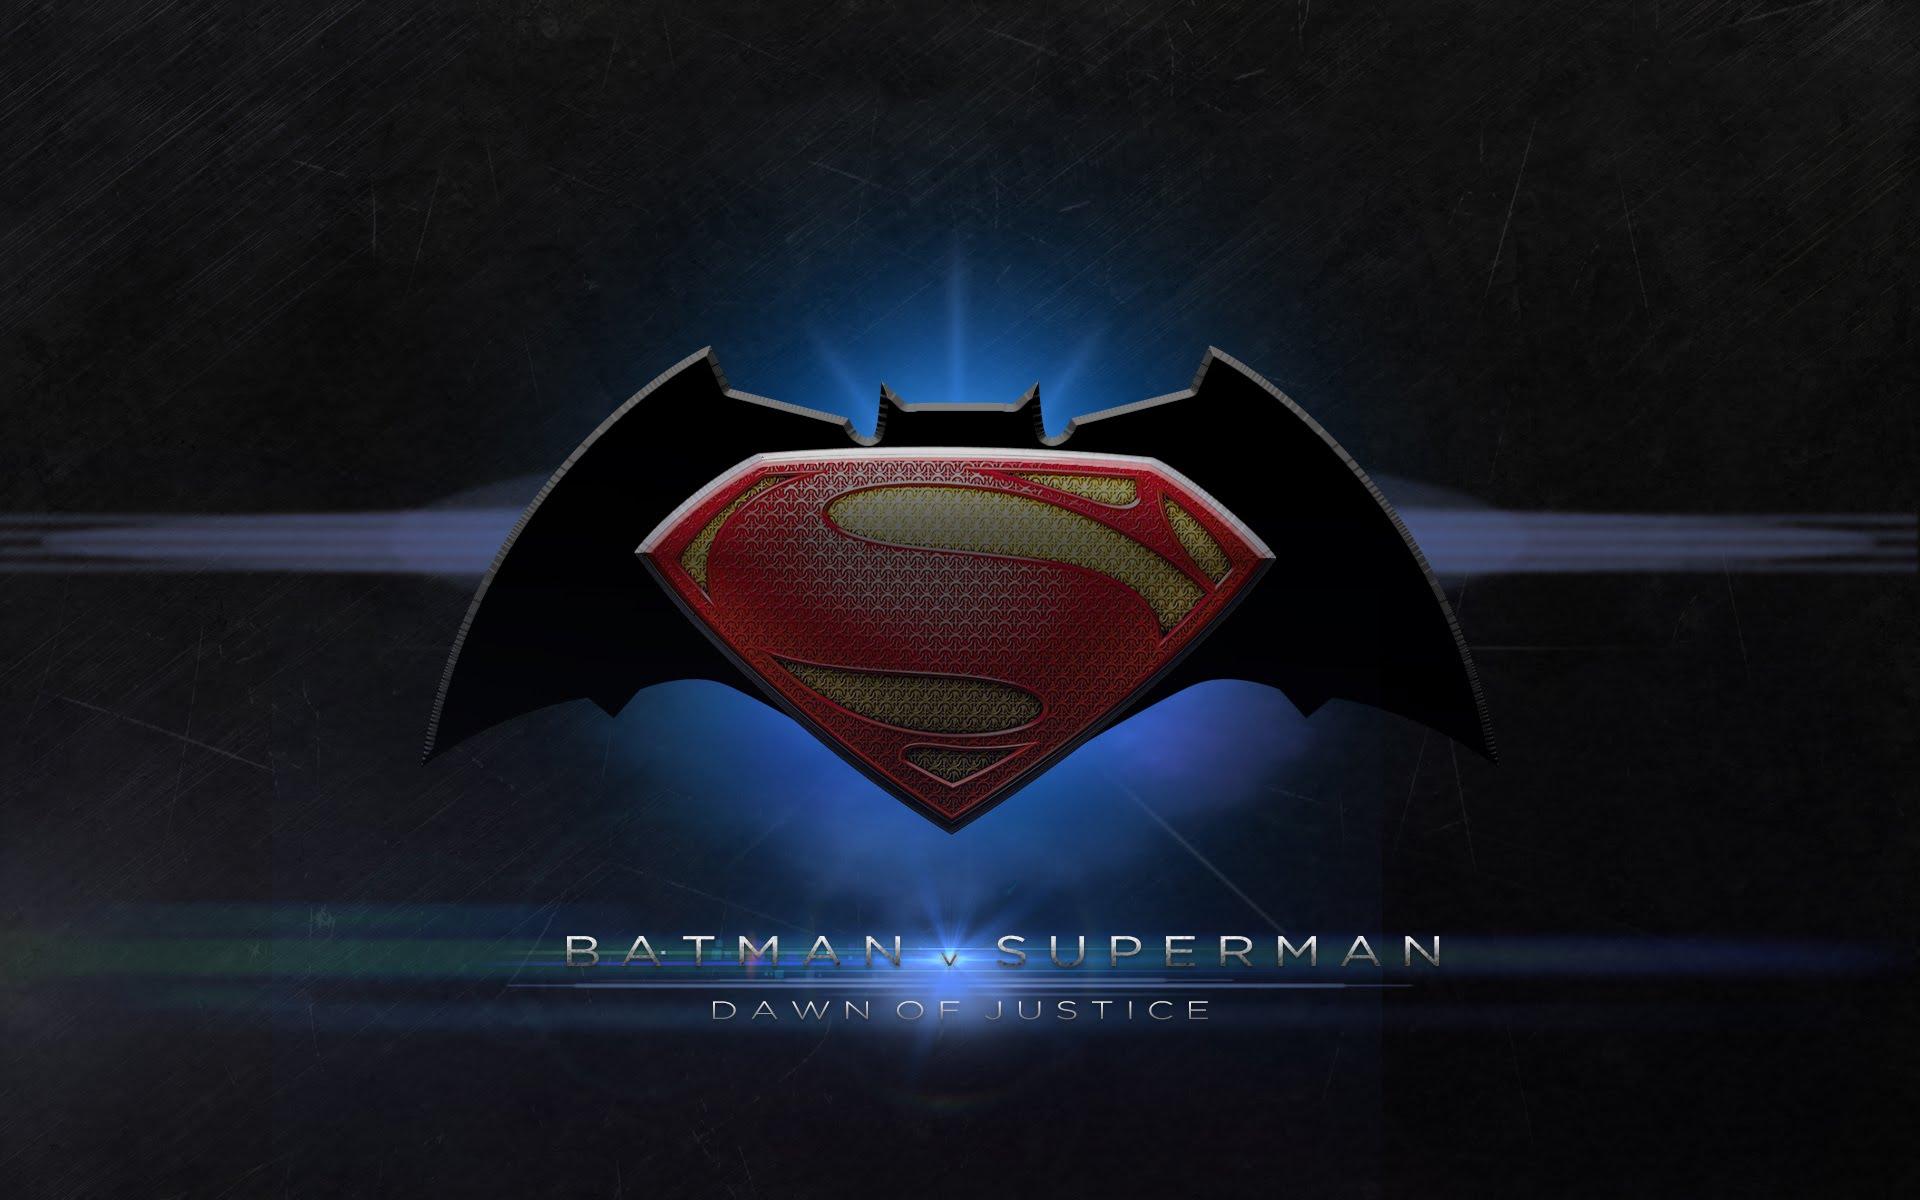 batman vs superman logo hd movies 4k wallpapers images